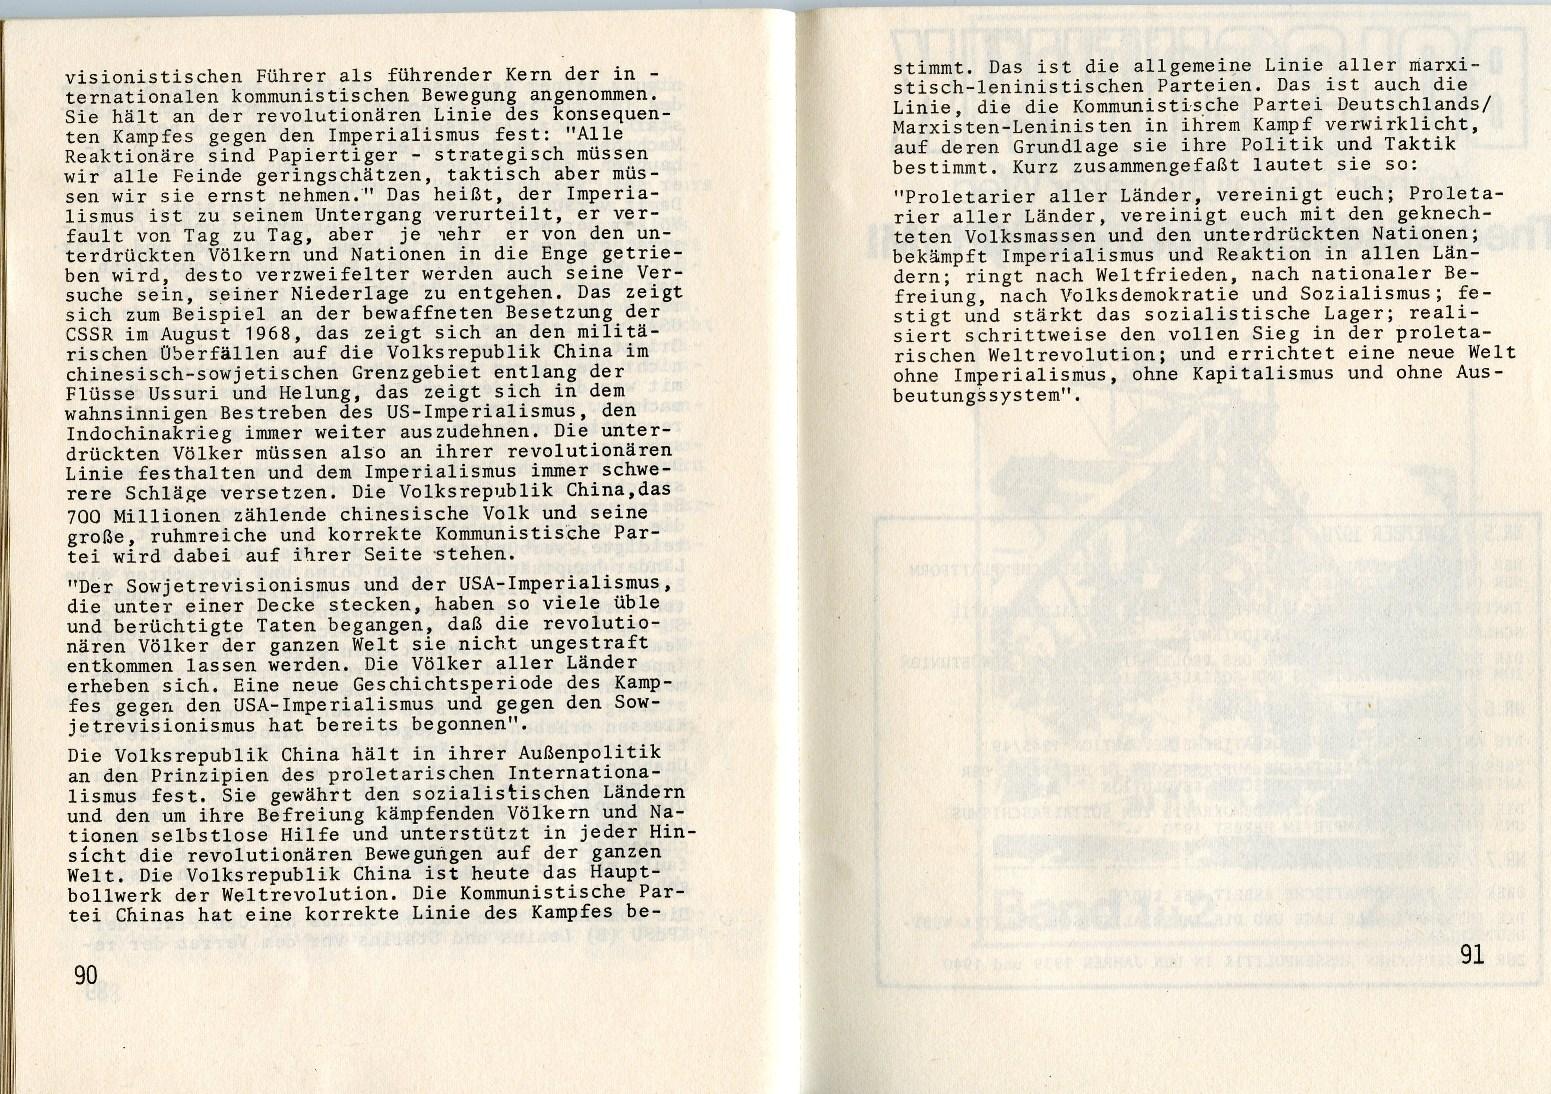 ZB_KPChinas_1971_47